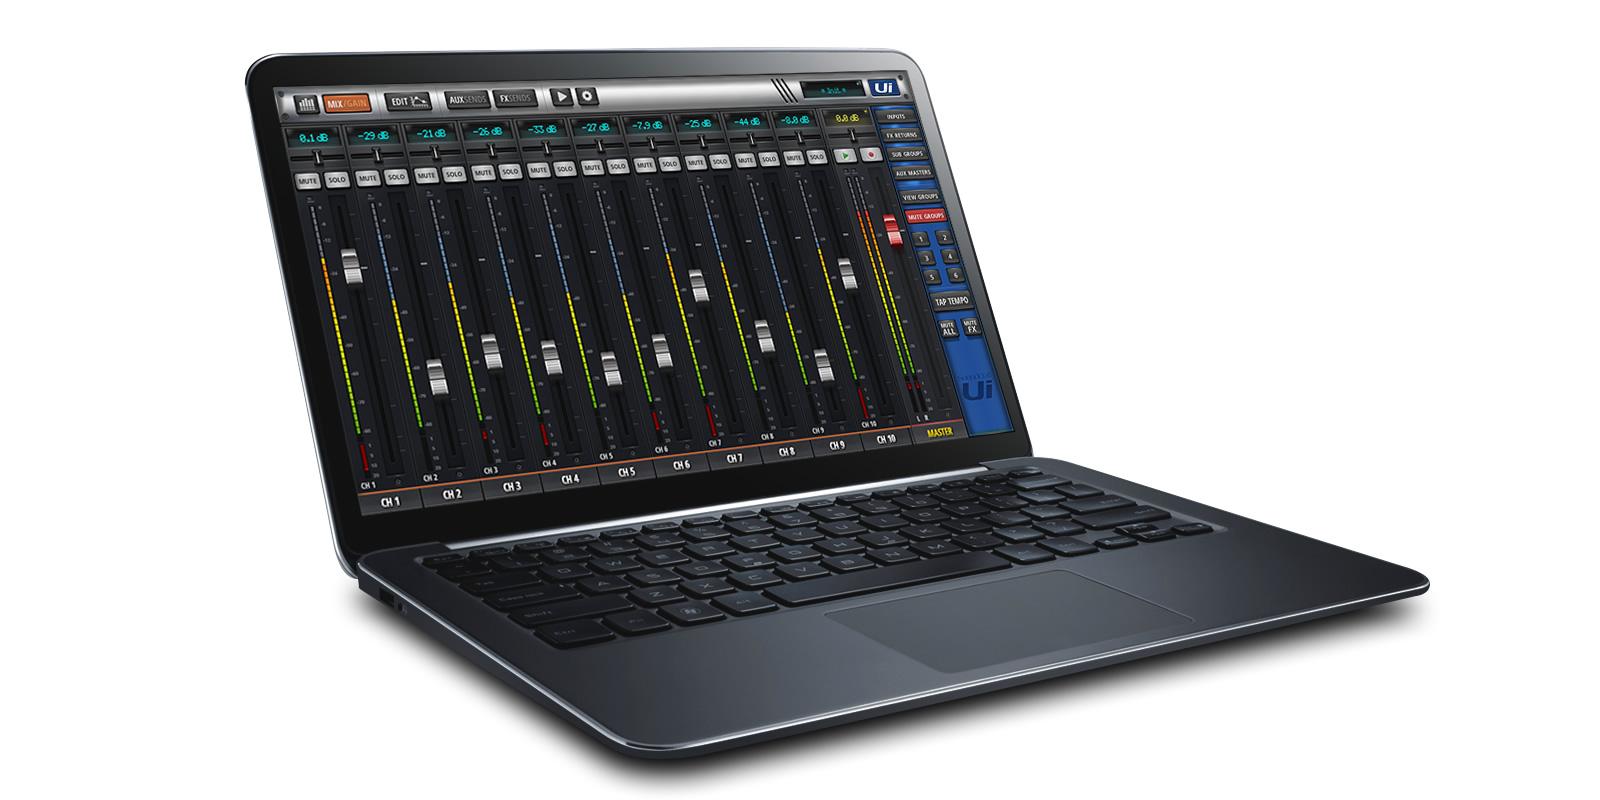 Free images: laptop, notebook, music, technology, equipment, set.